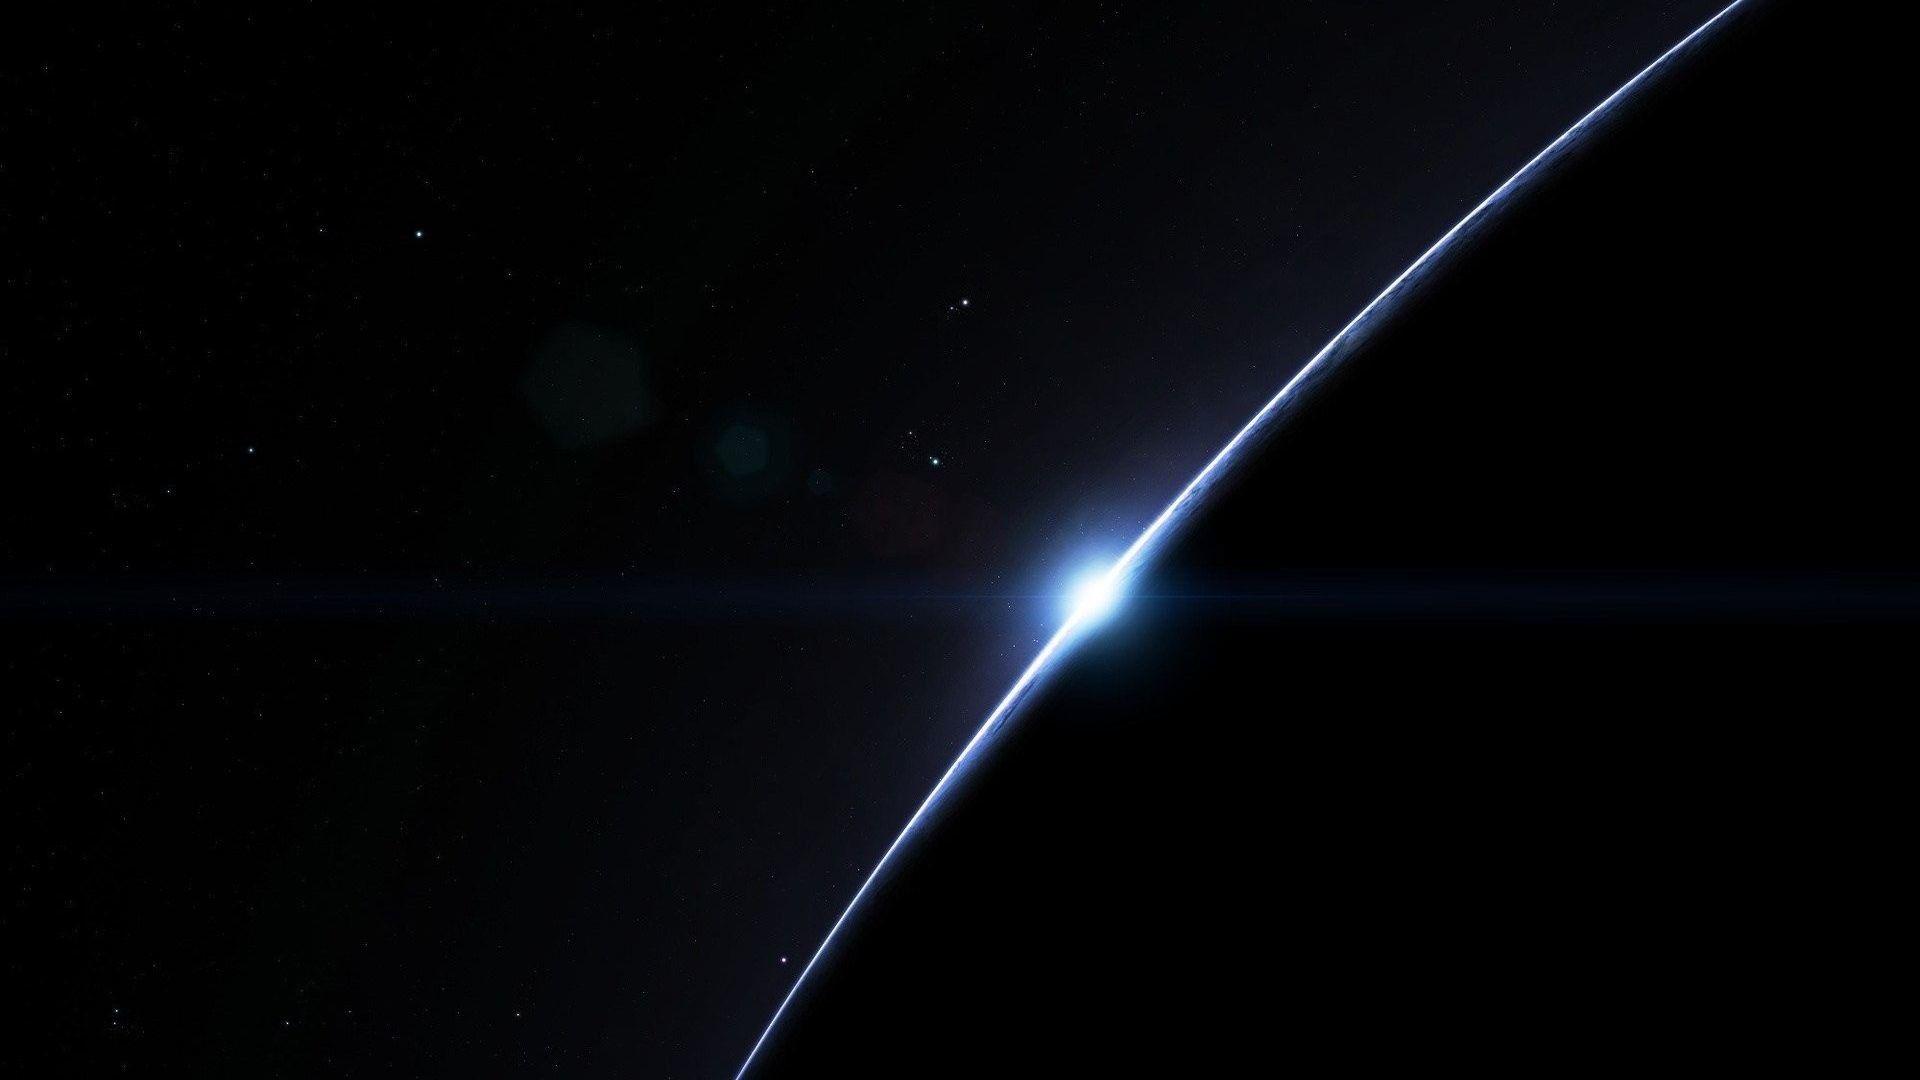 Download Planet Space Dark Sunrise Simple Stars Green Nature Wallpaper Hd For Desktop Free Download